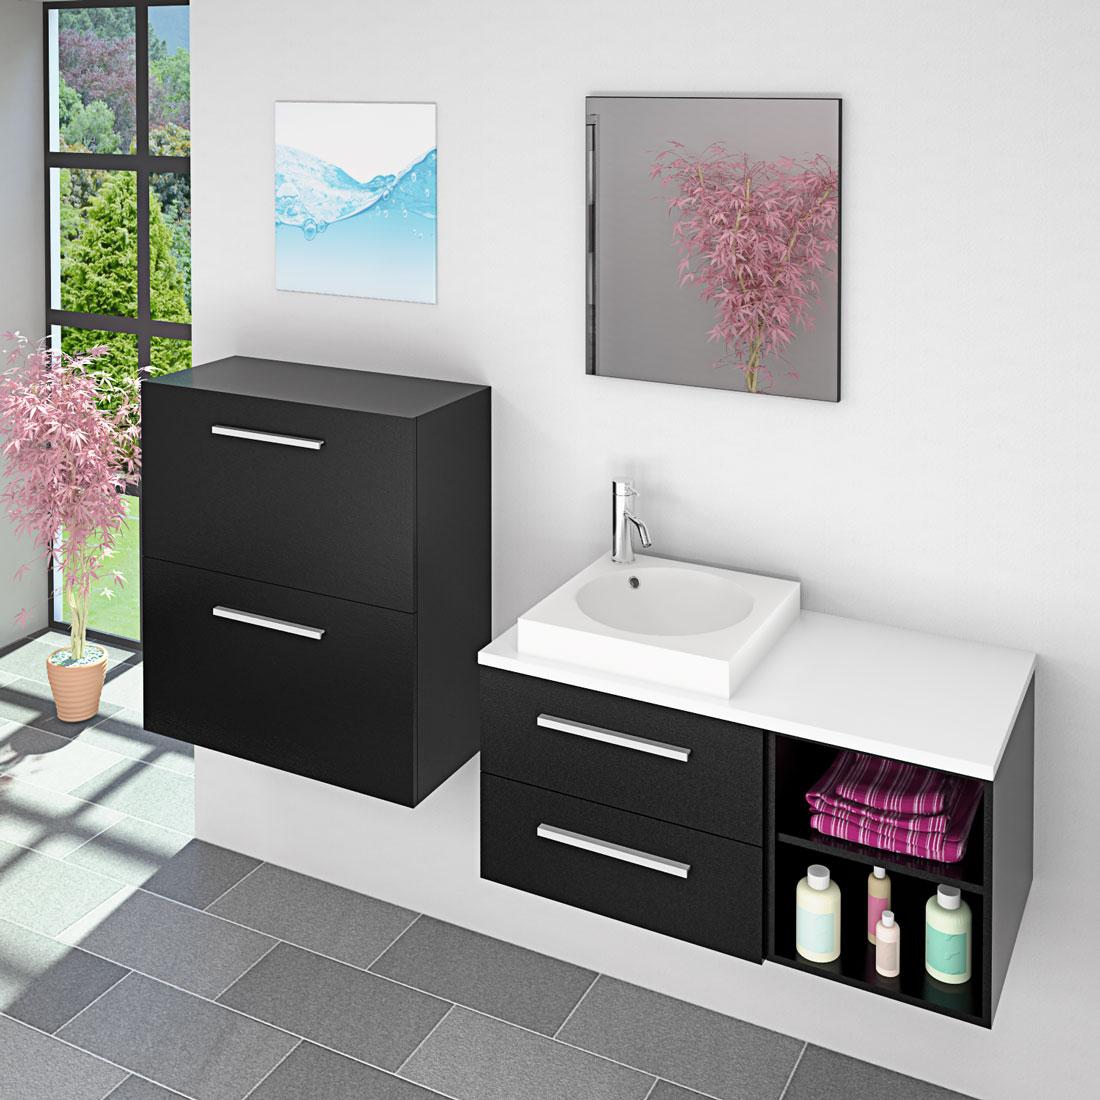 badm bel set city 204 v6 esche schwarz badezimmerm bel waschtisch 100cm. Black Bedroom Furniture Sets. Home Design Ideas